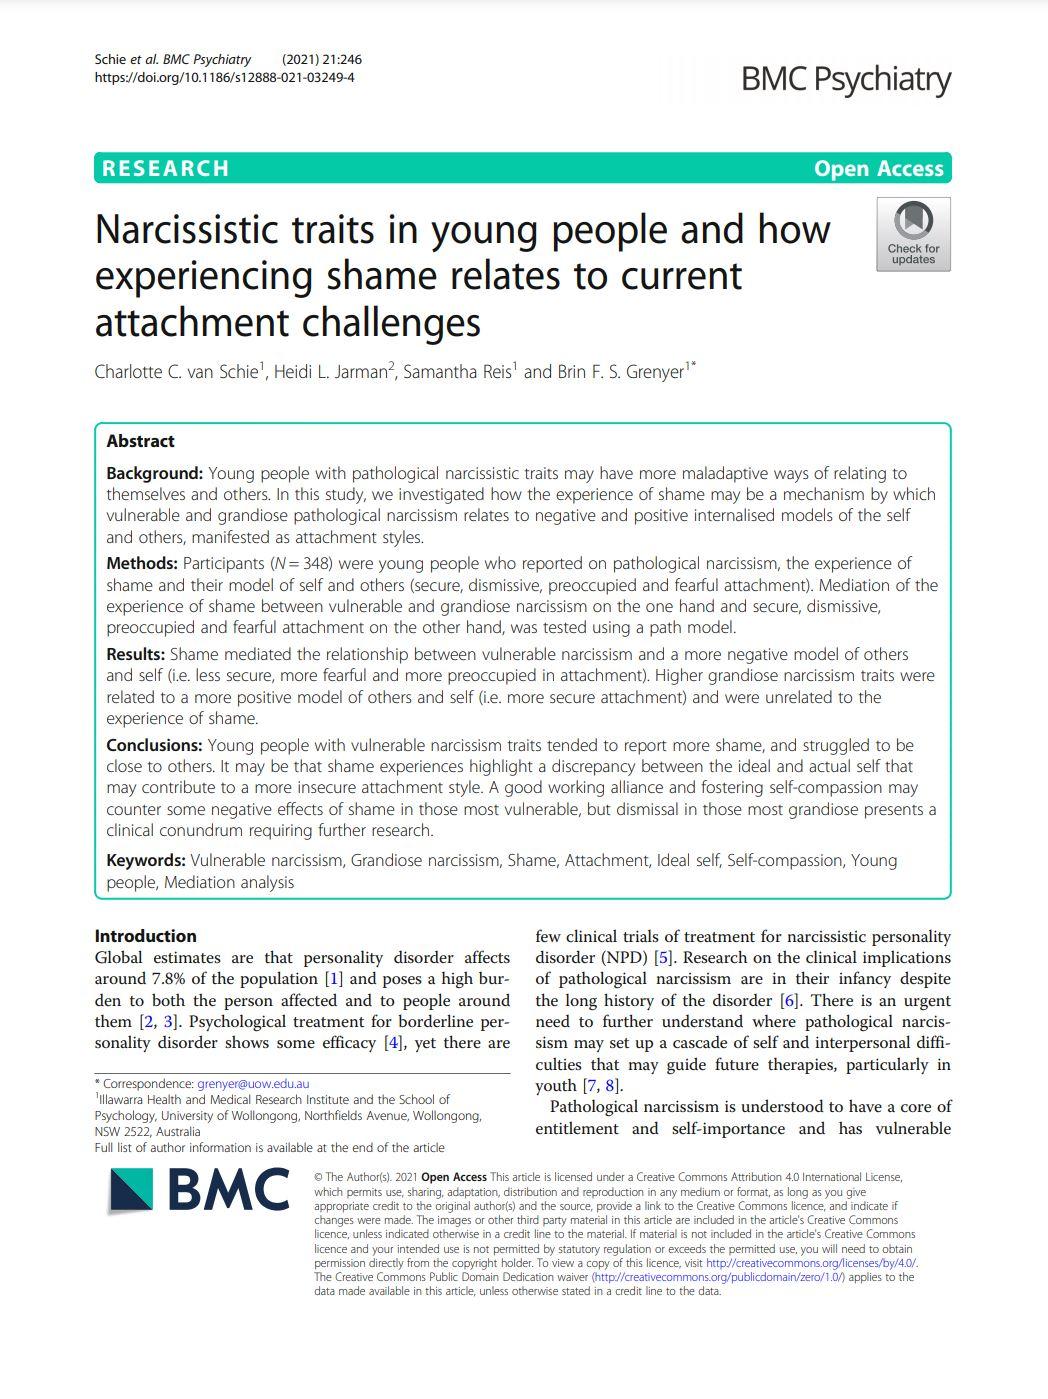 Research Narcissistic traits